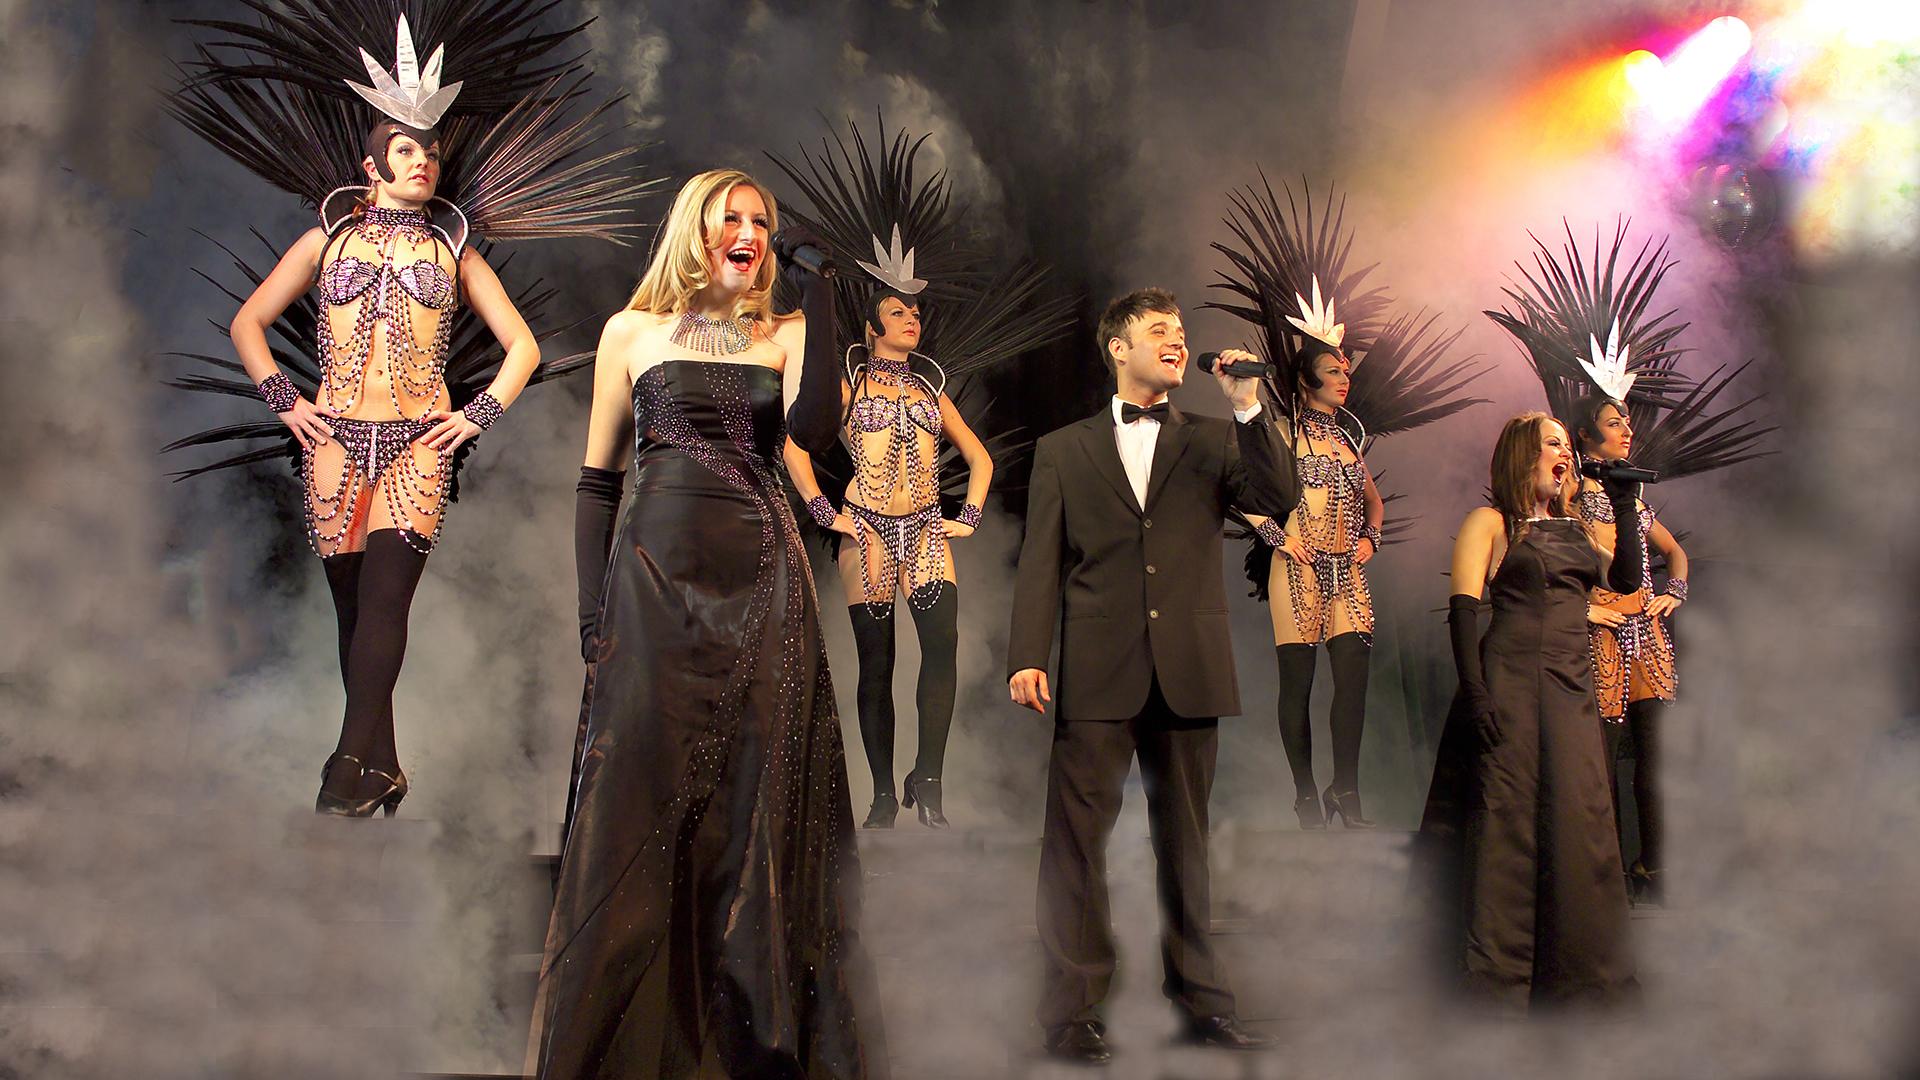 Chorus Line 11 Explosive Productions at Center Parcs, Penrith.